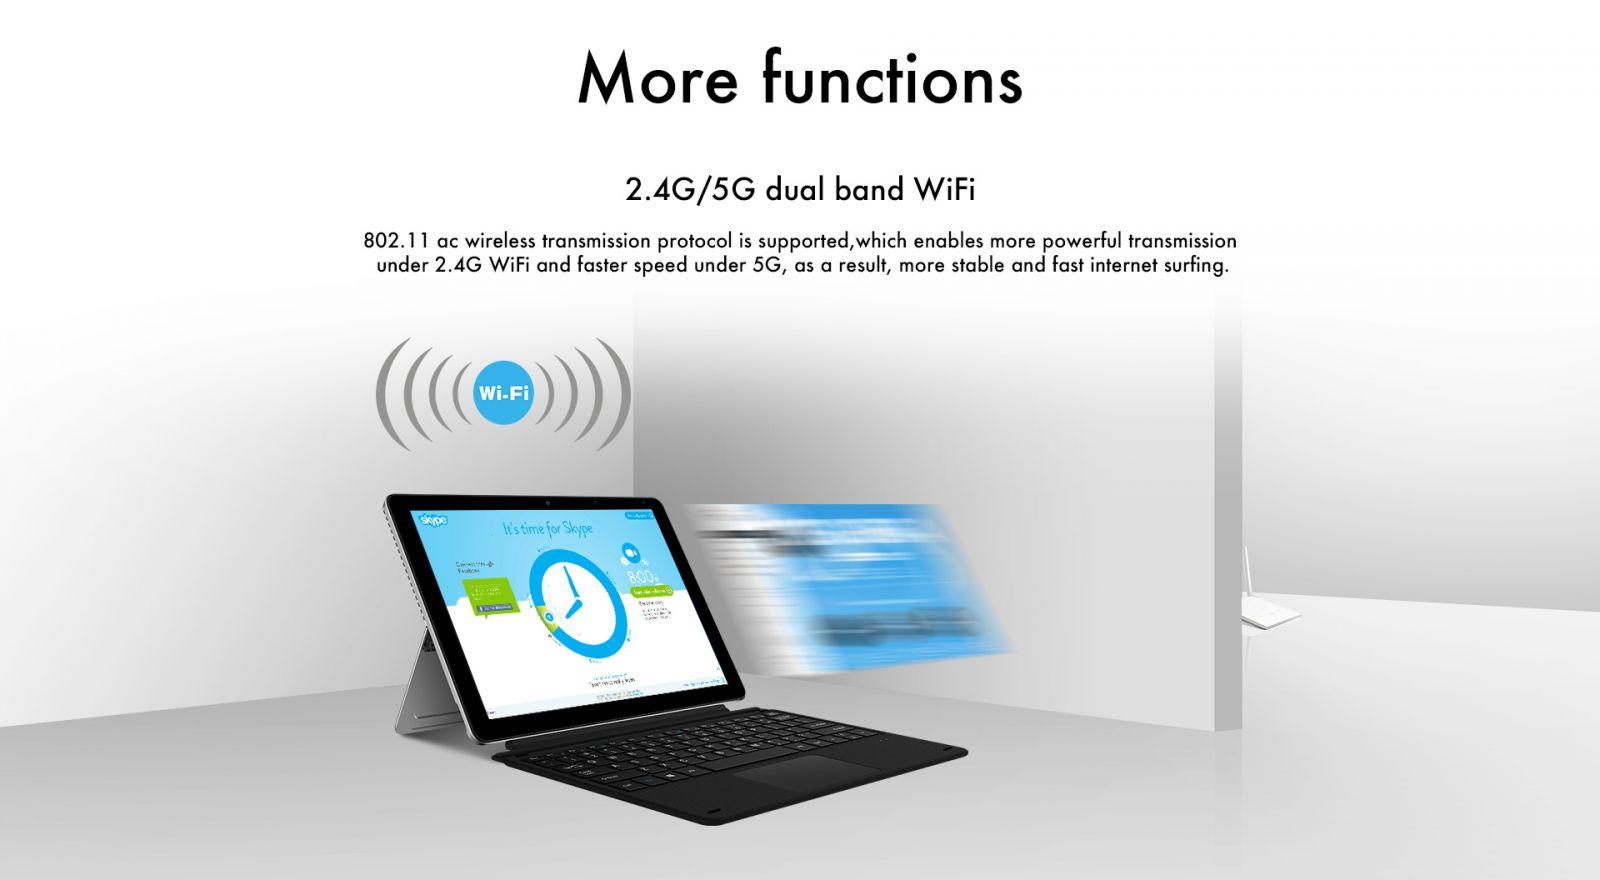 Info Harga Alldocube Iwork 10 Pro 2 In 1 Tablet Pc 101 Inch Windows Otomobil Head Lamp Set Su Sz 20 5093 05 2b Suzuki Baleno 1995 1996 1997 1998 Lights Chuwi Surbook Mini Intel 4gb 64gb 108